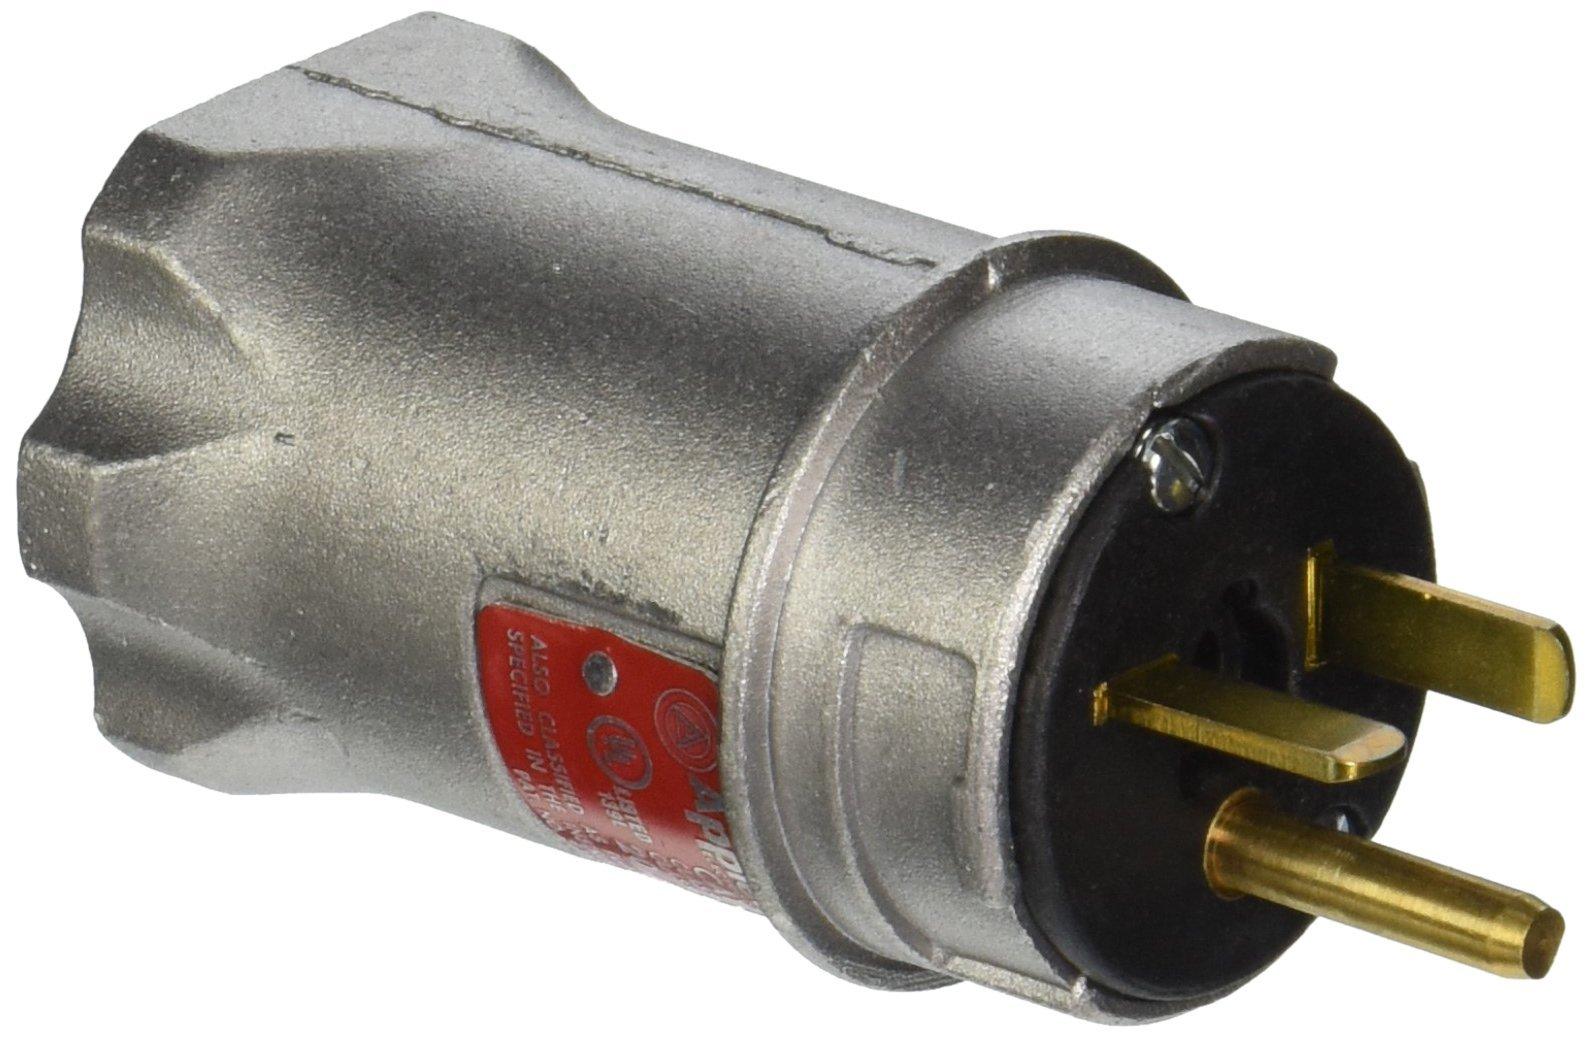 Appleton ECP-20232 Plug, 250, 20A, 2W, 3P, 6-20P